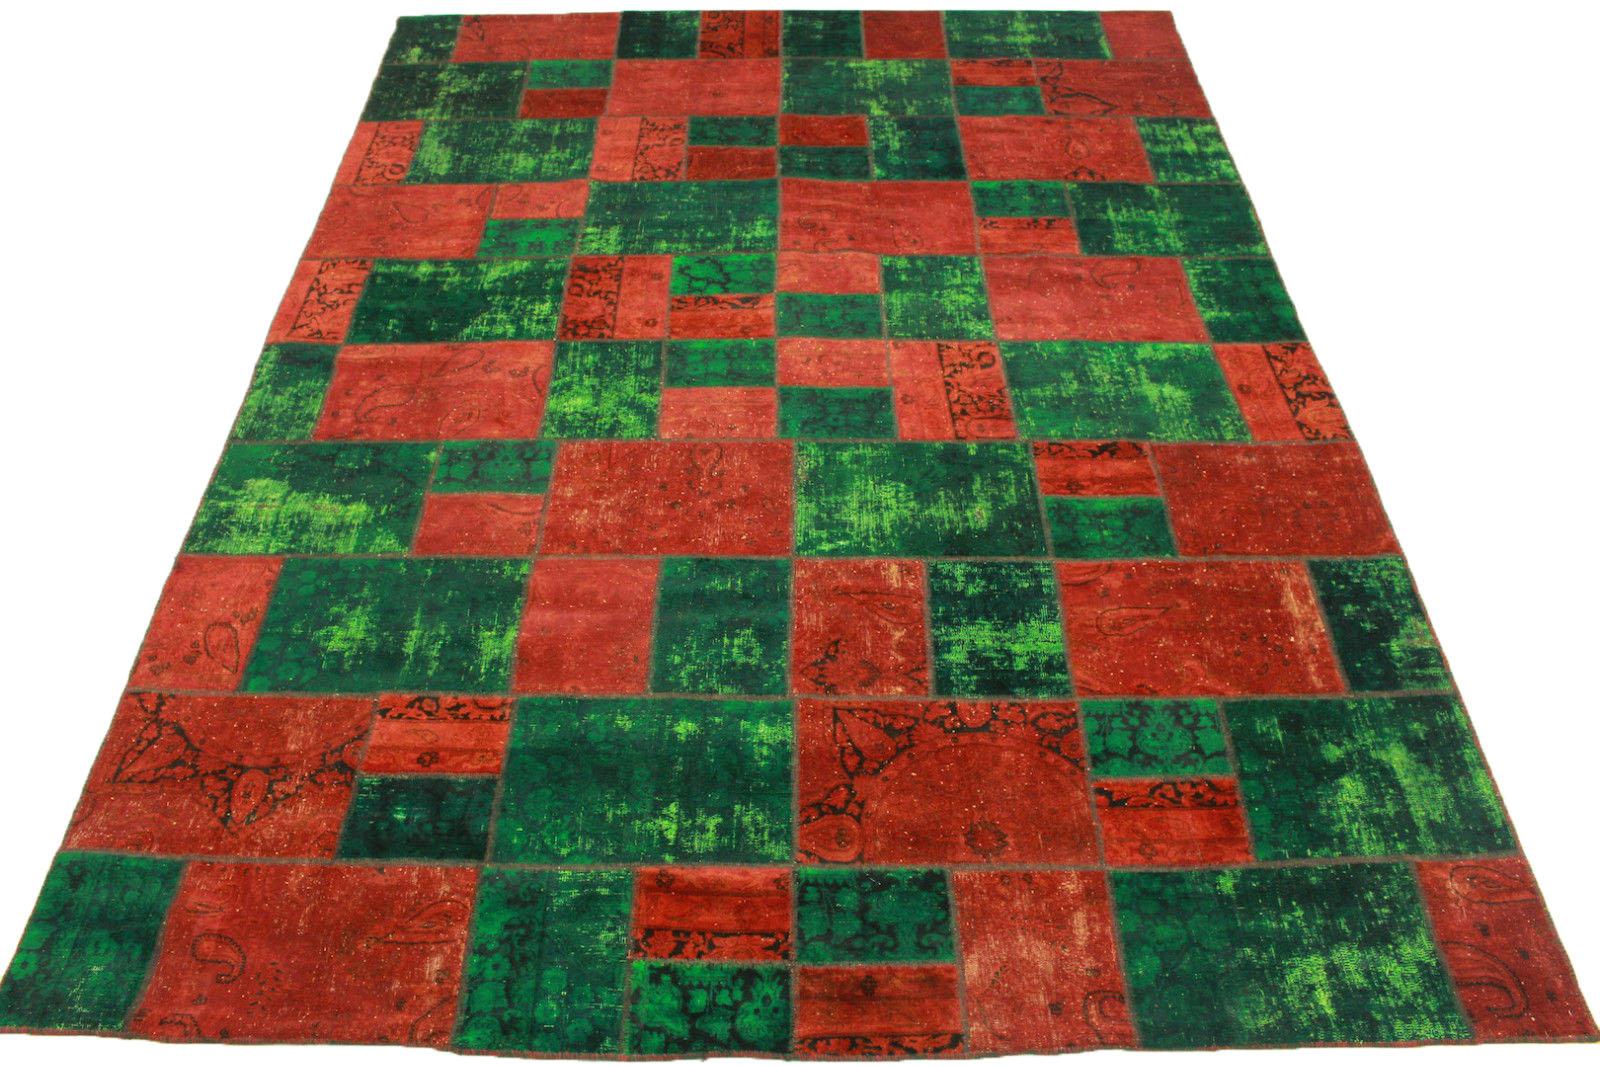 patchwork teppich gr n rot in 400x300cm 1001 1845 bei kaufen. Black Bedroom Furniture Sets. Home Design Ideas